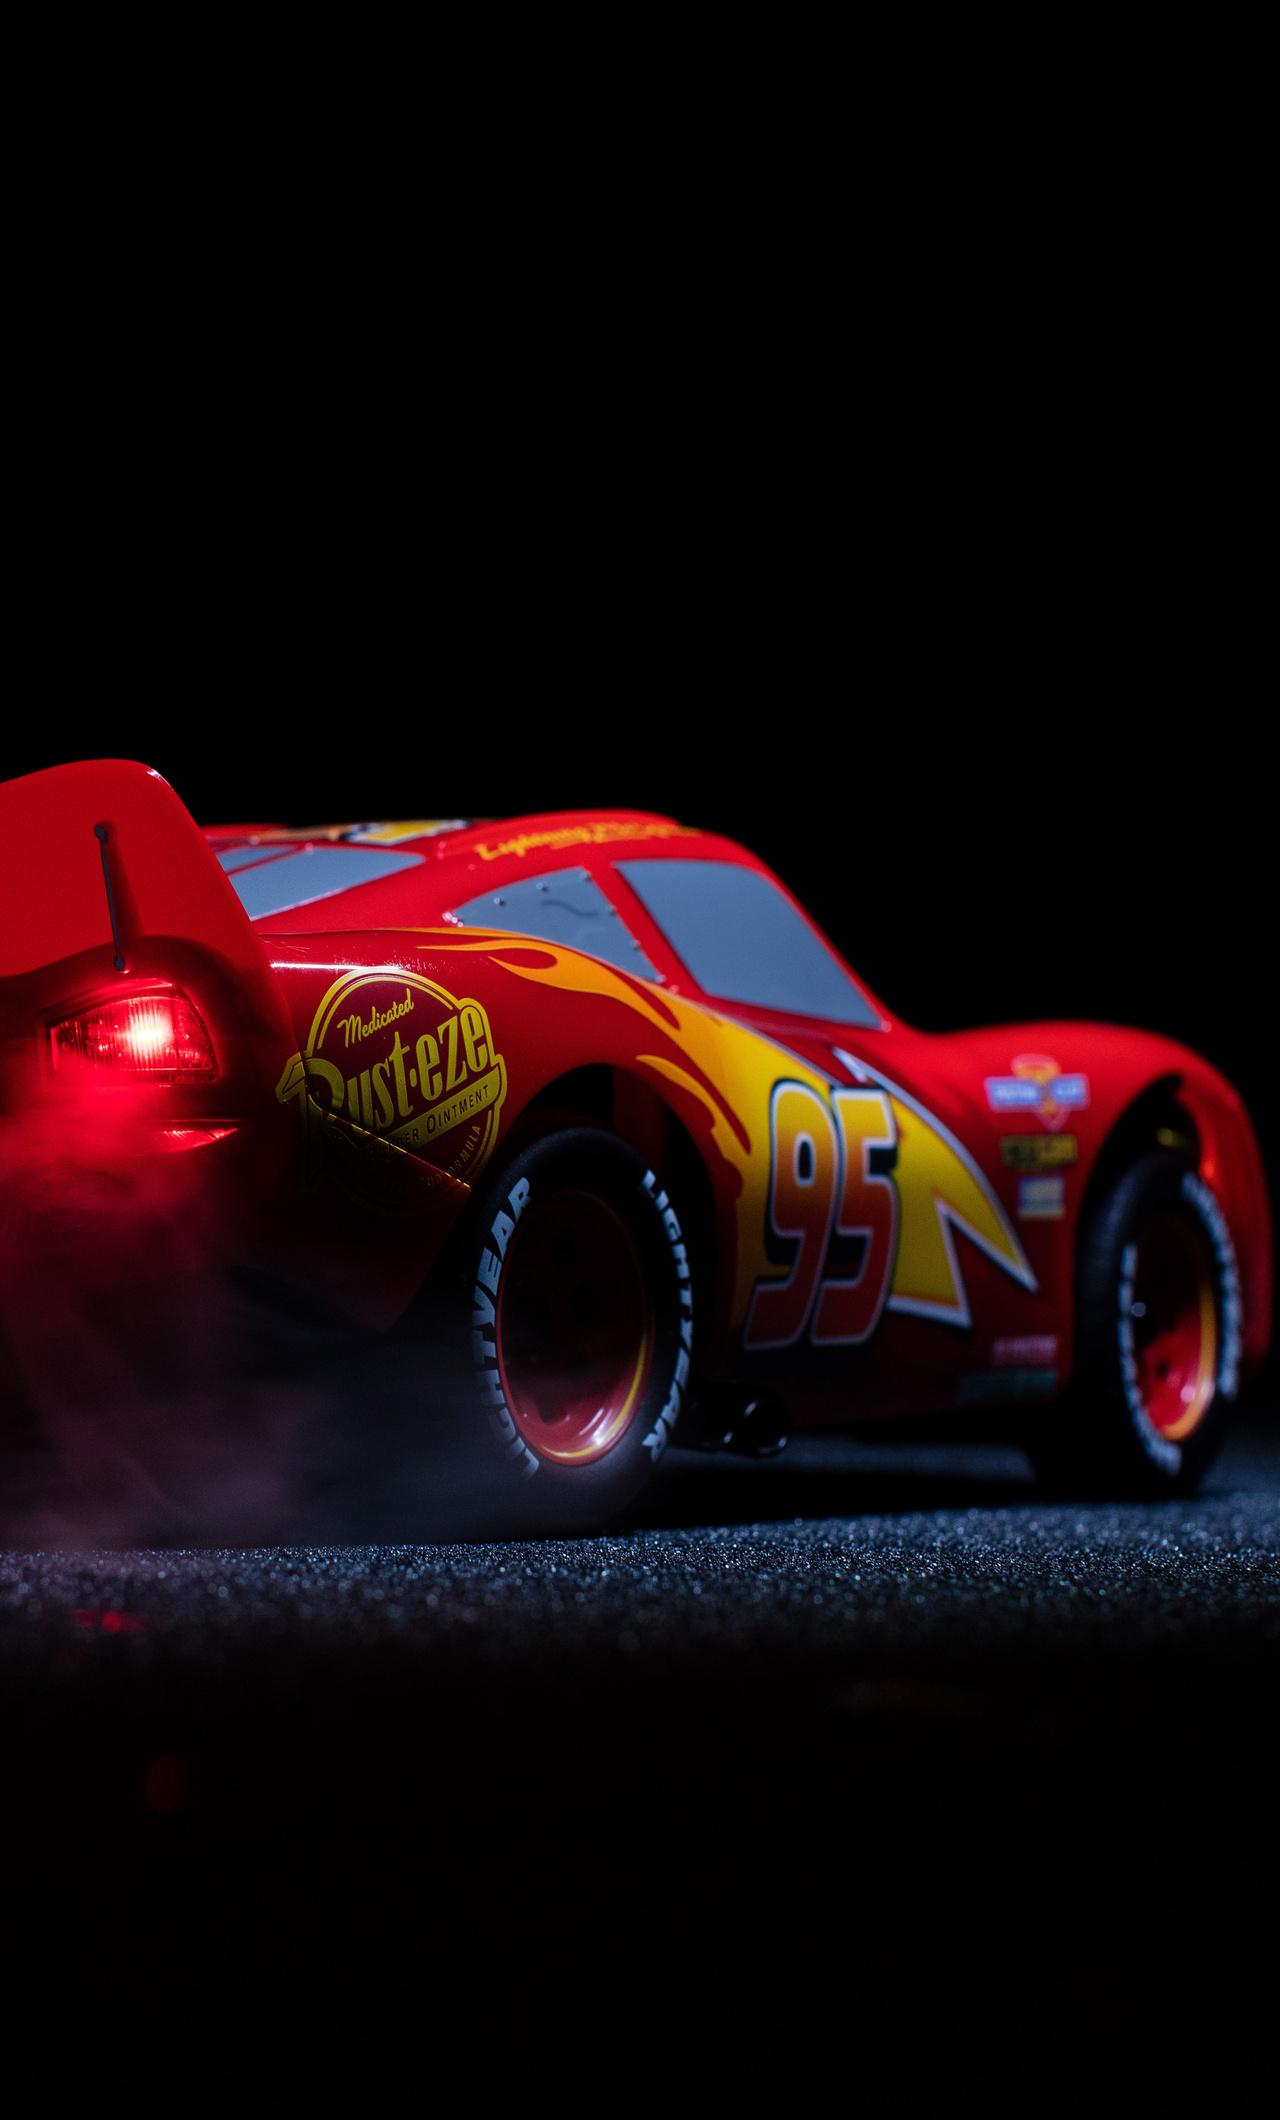 1280x2120 Lightning McQueen Cars 3 Pixar Disney 4k iPhone ...